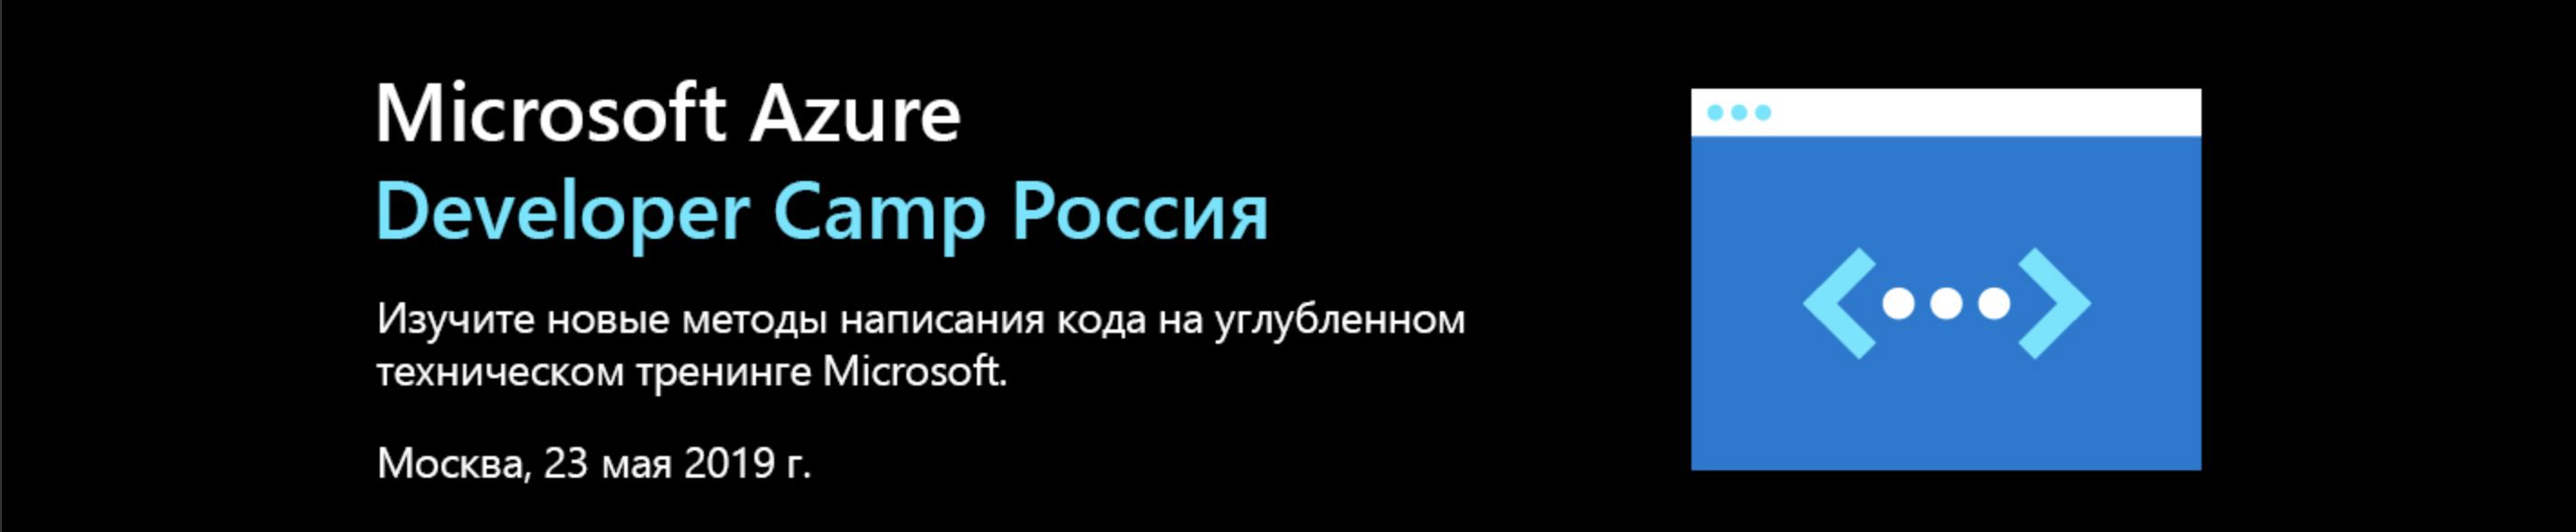 Microsoft Azure Developer Camp Россия